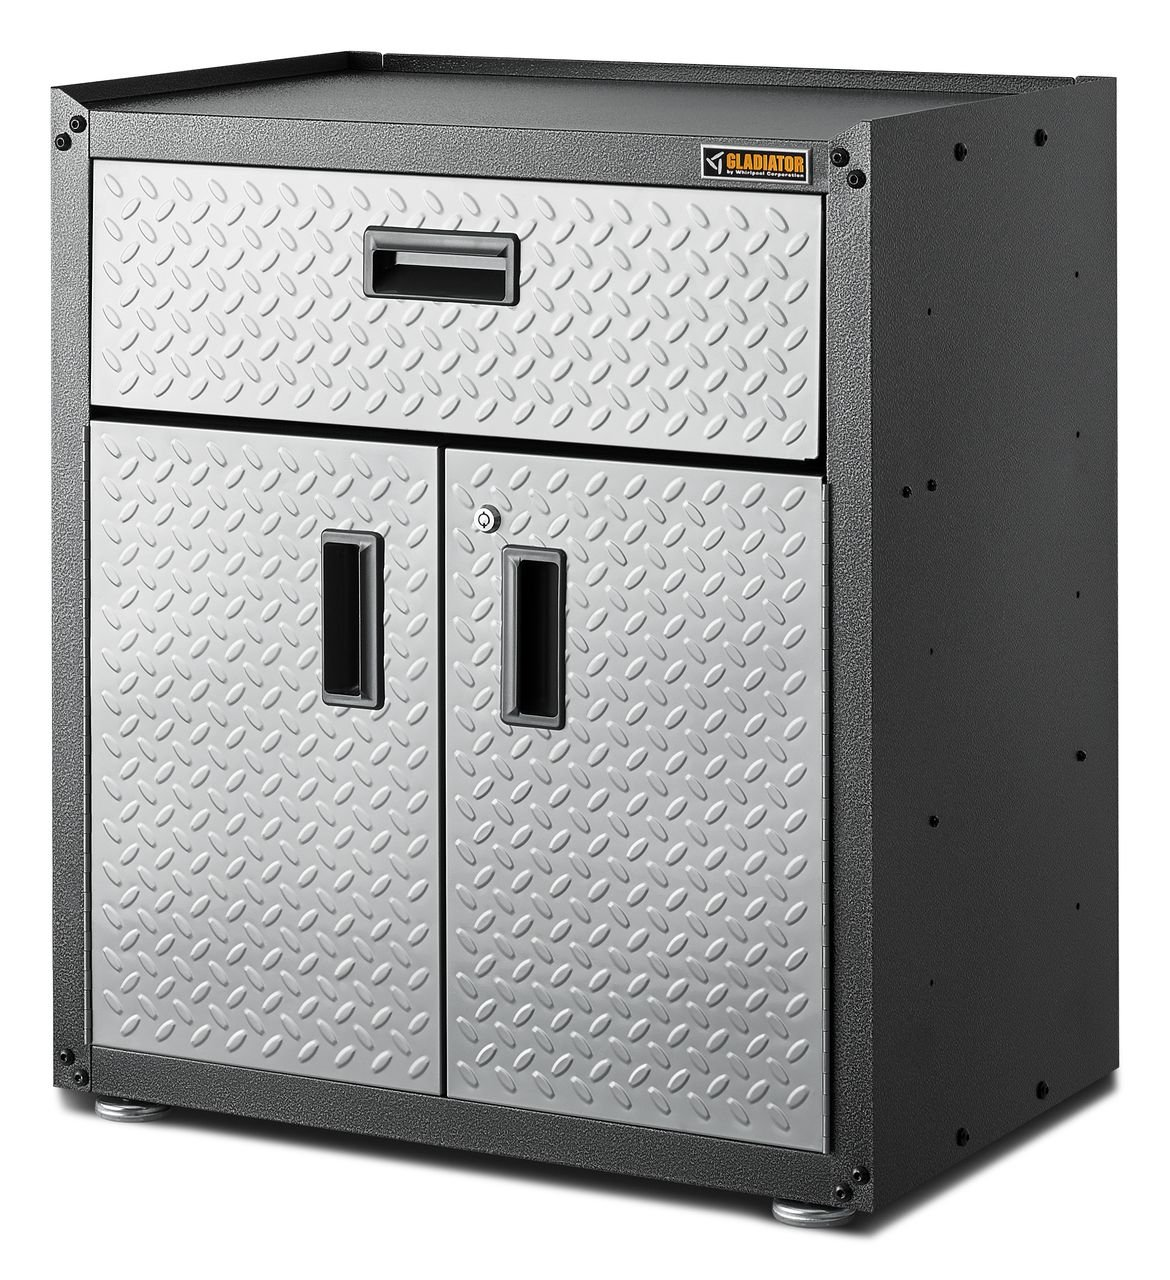 Amazon.com: Gladiator GAGB28KDYG Ready-to-Assemble 3/4 Door Modular  GearBox: Home Improvement